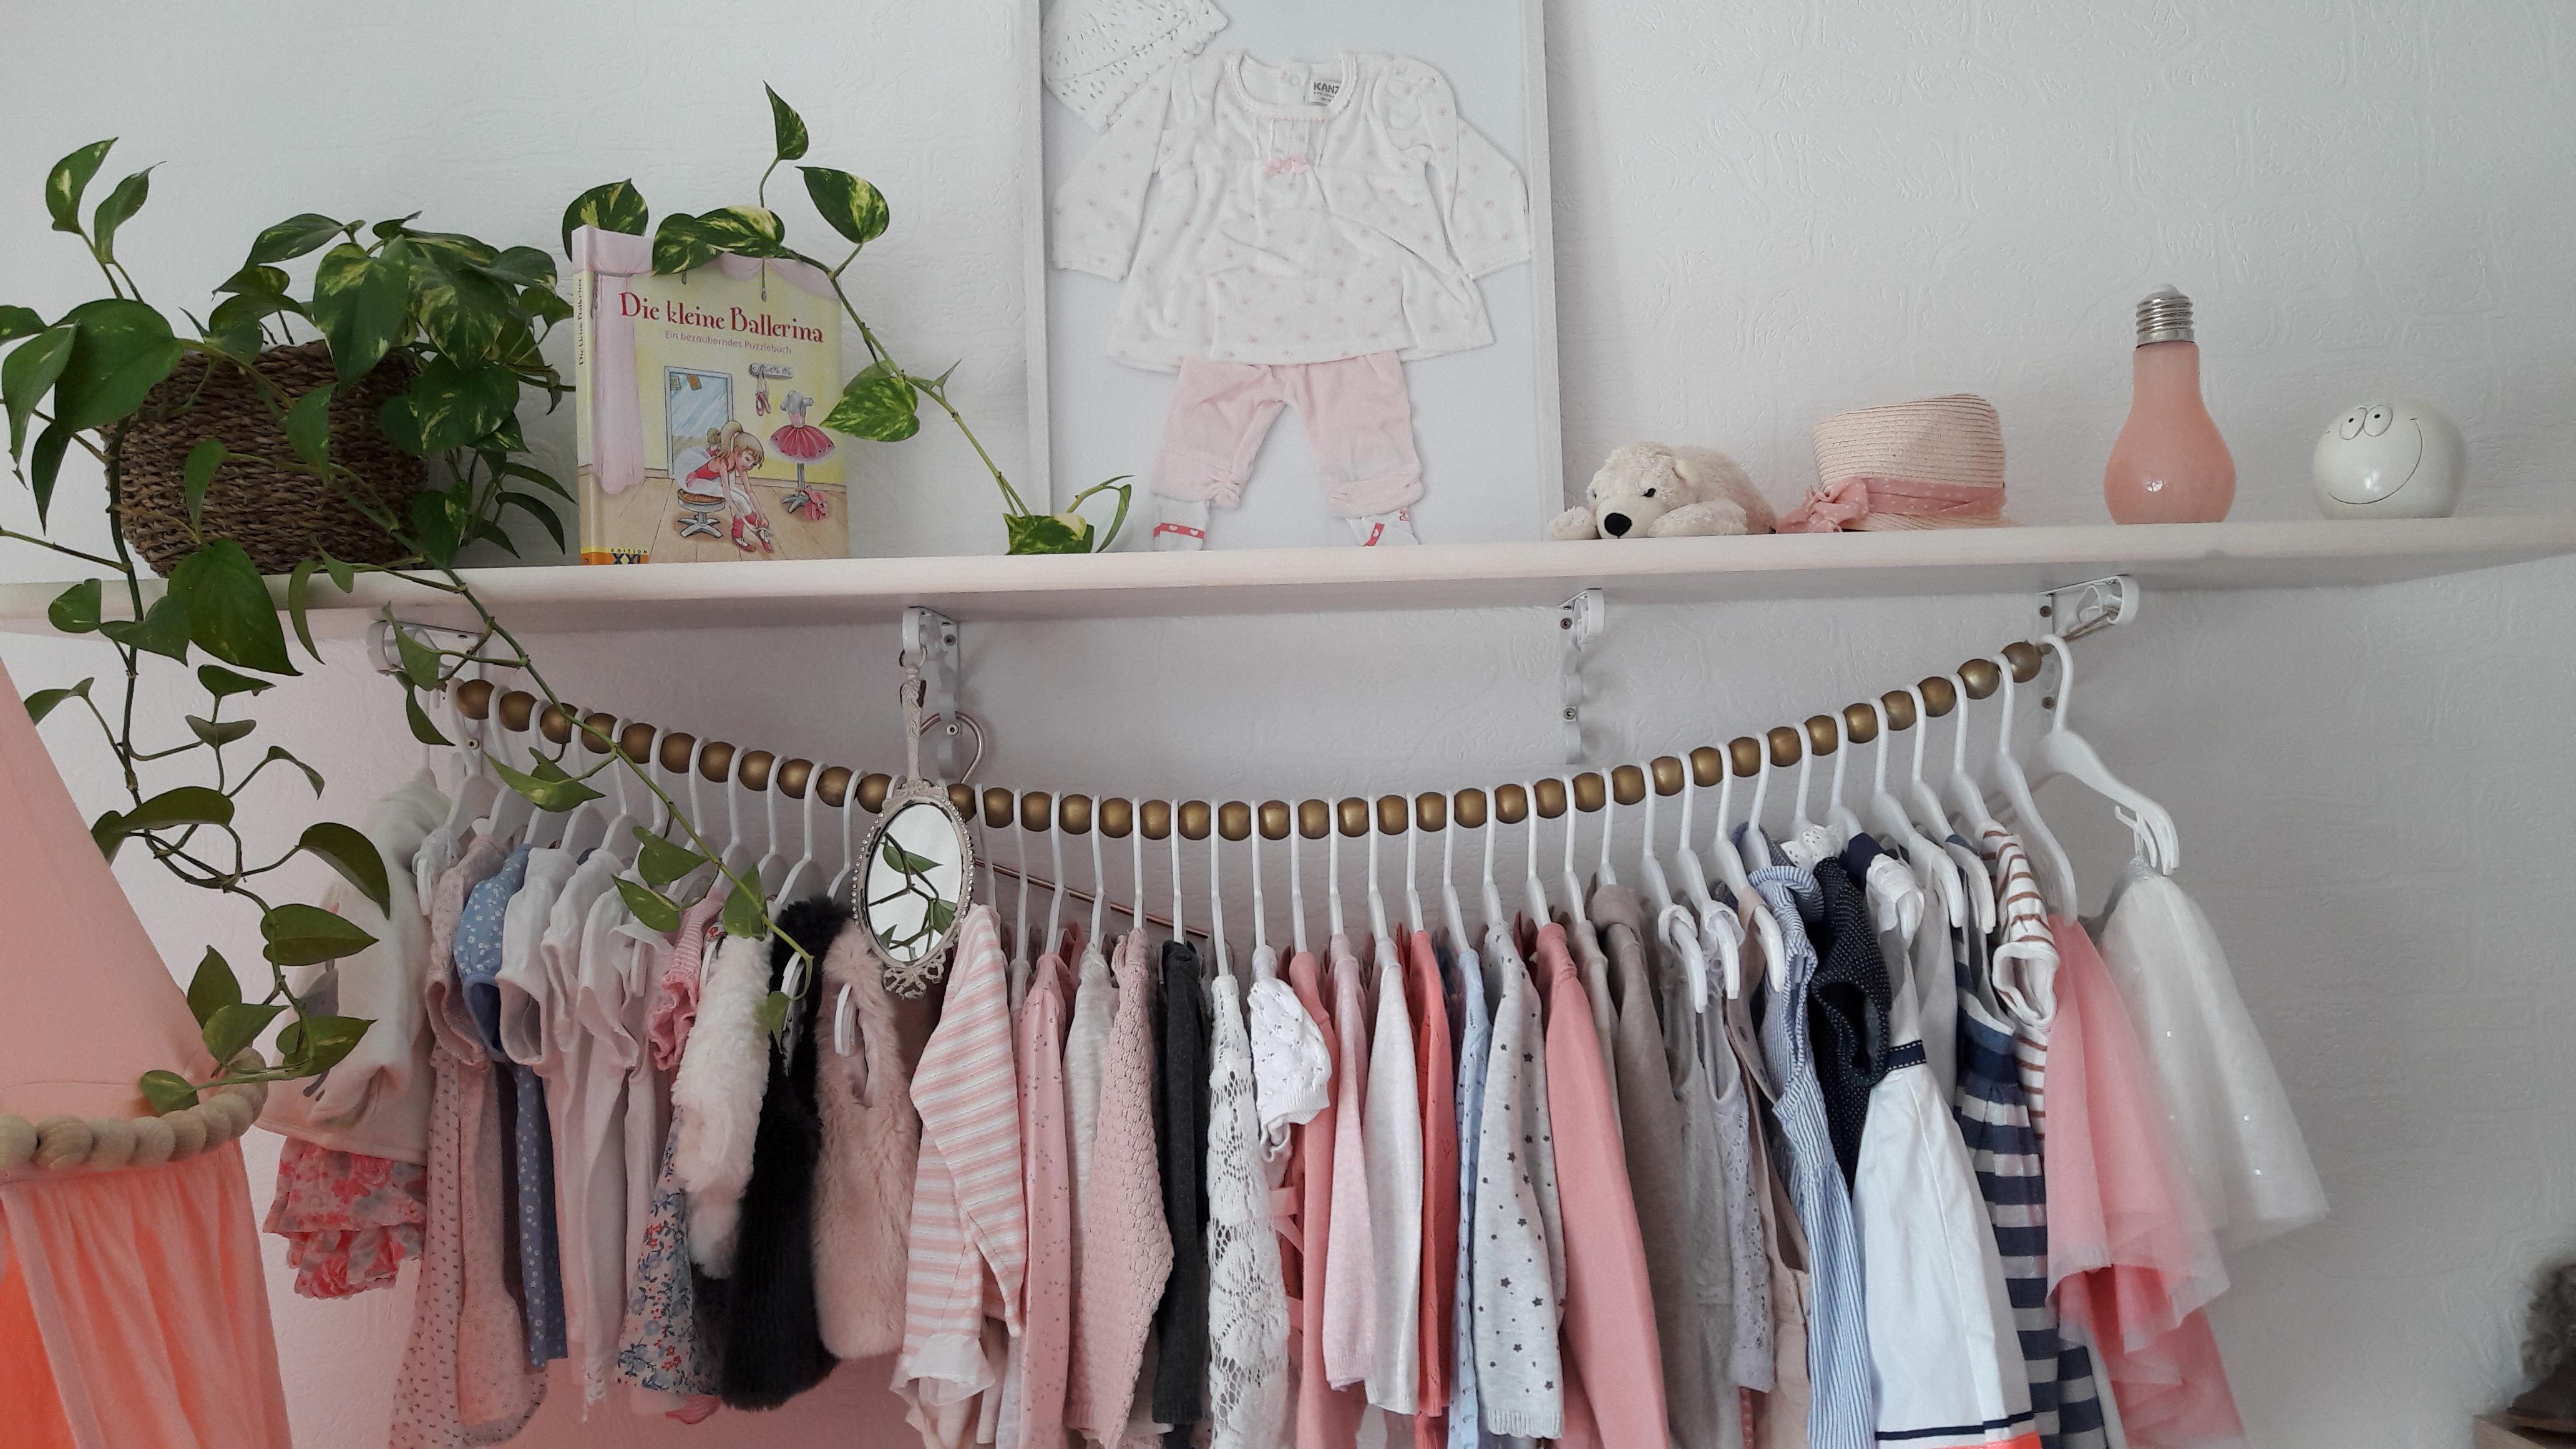 Garderobe bilder ideen couchstyle for Garderobe deko